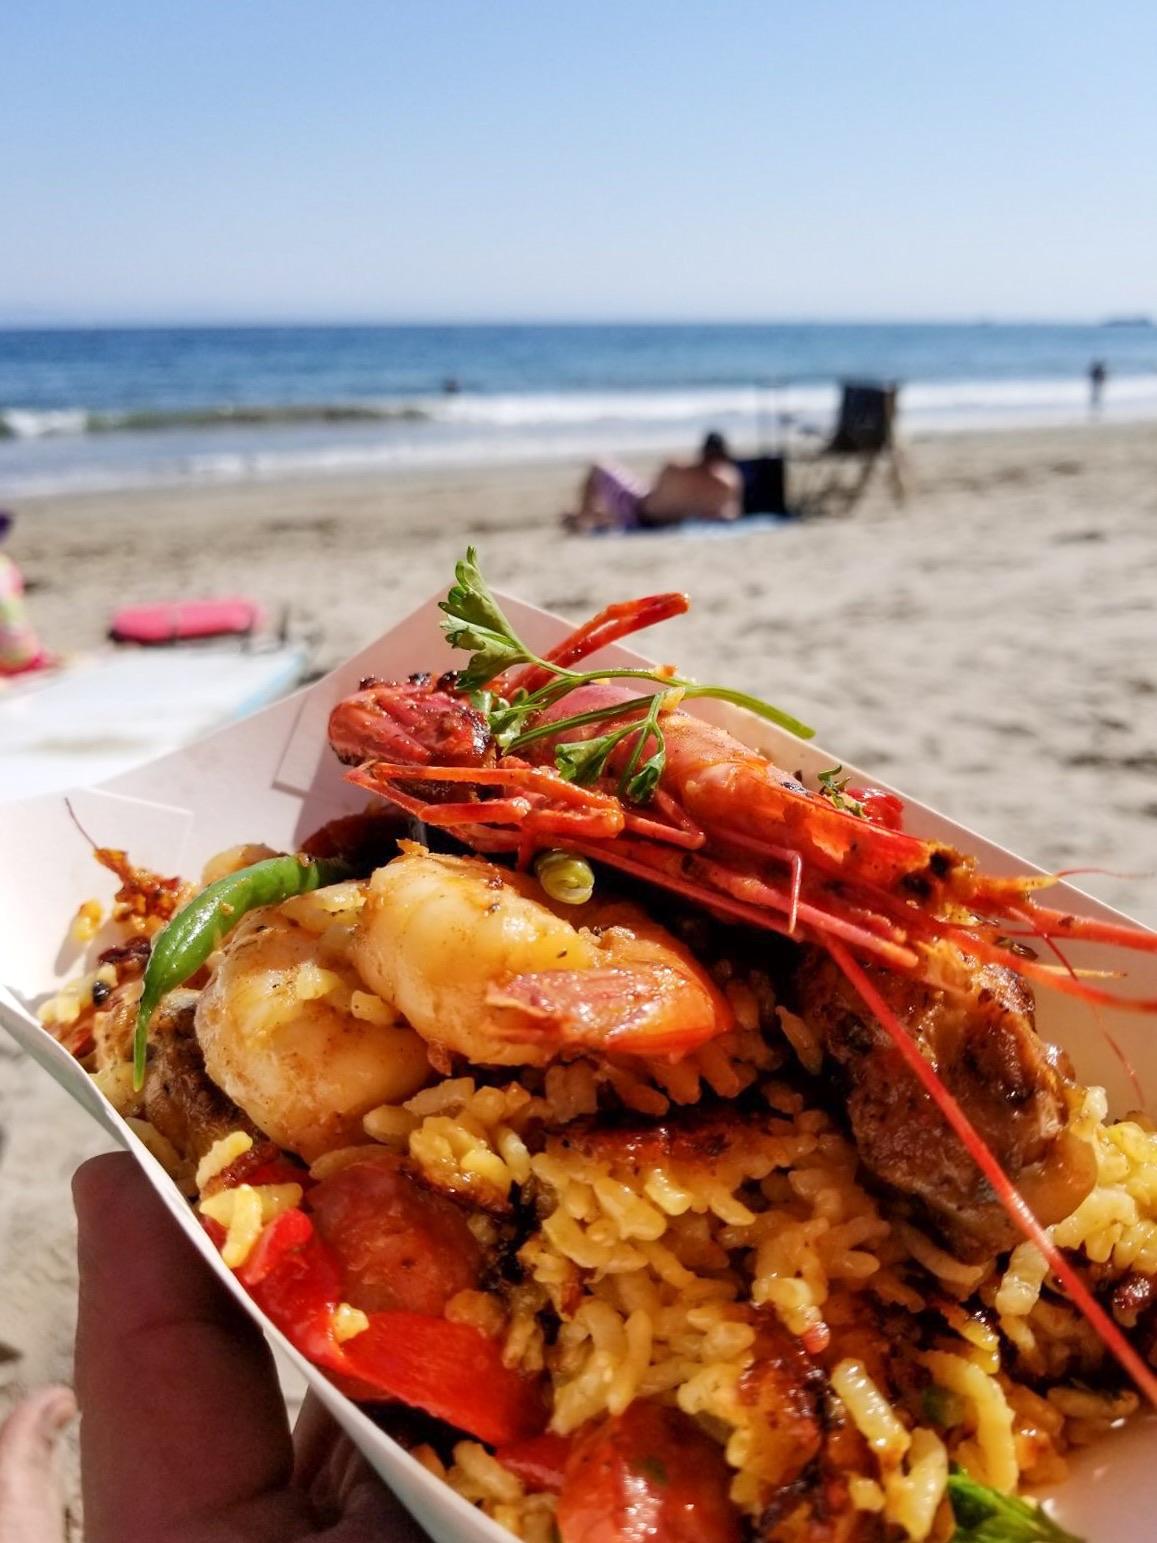 bomba-paella-catering-butterfly-beach5.jpg